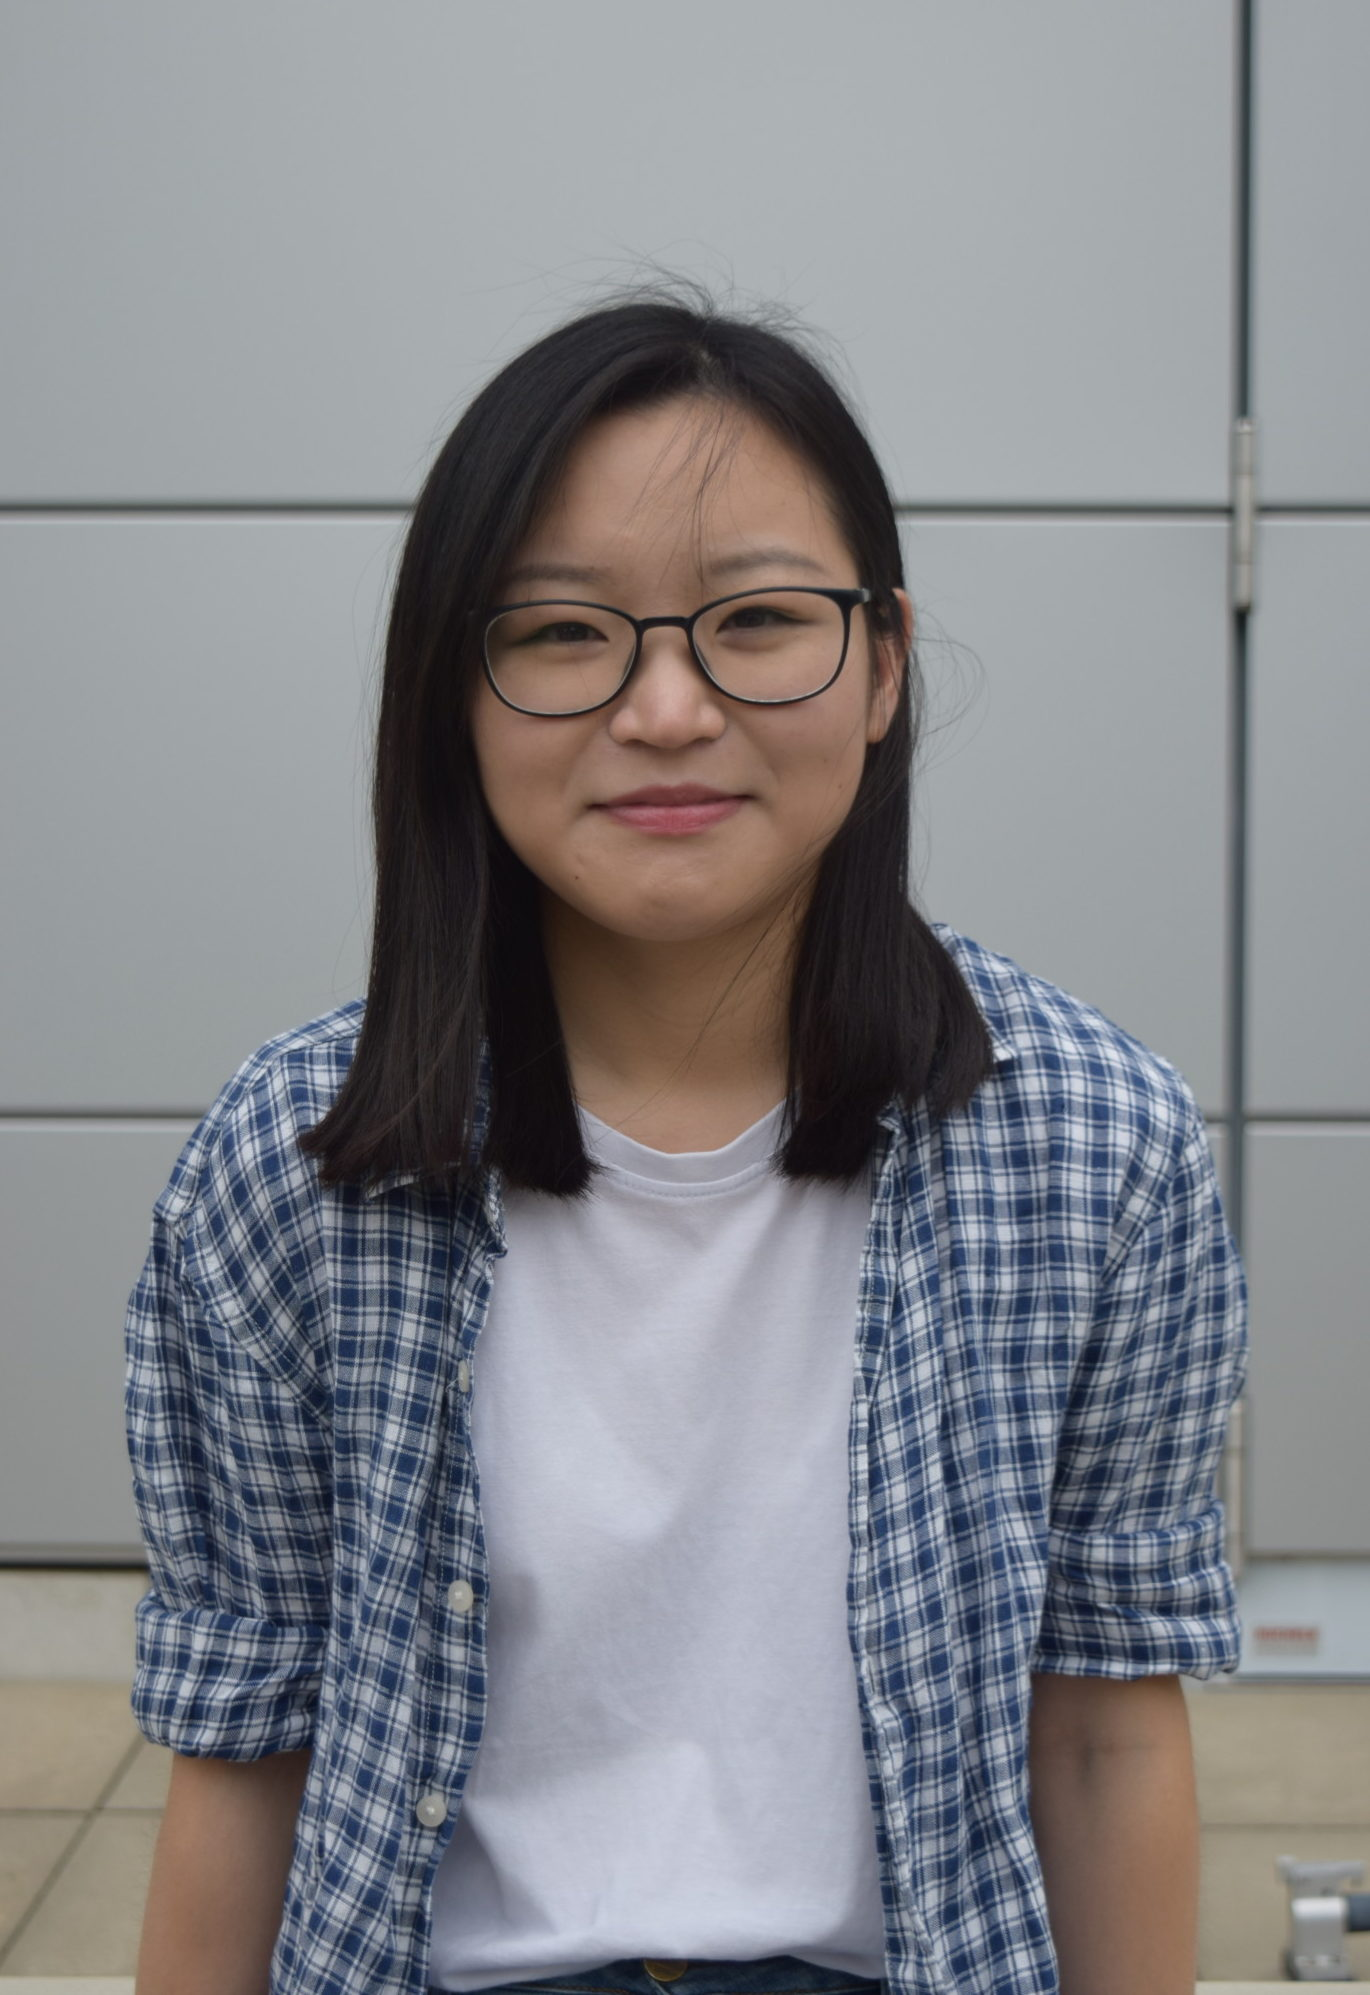 Jingna Qiu